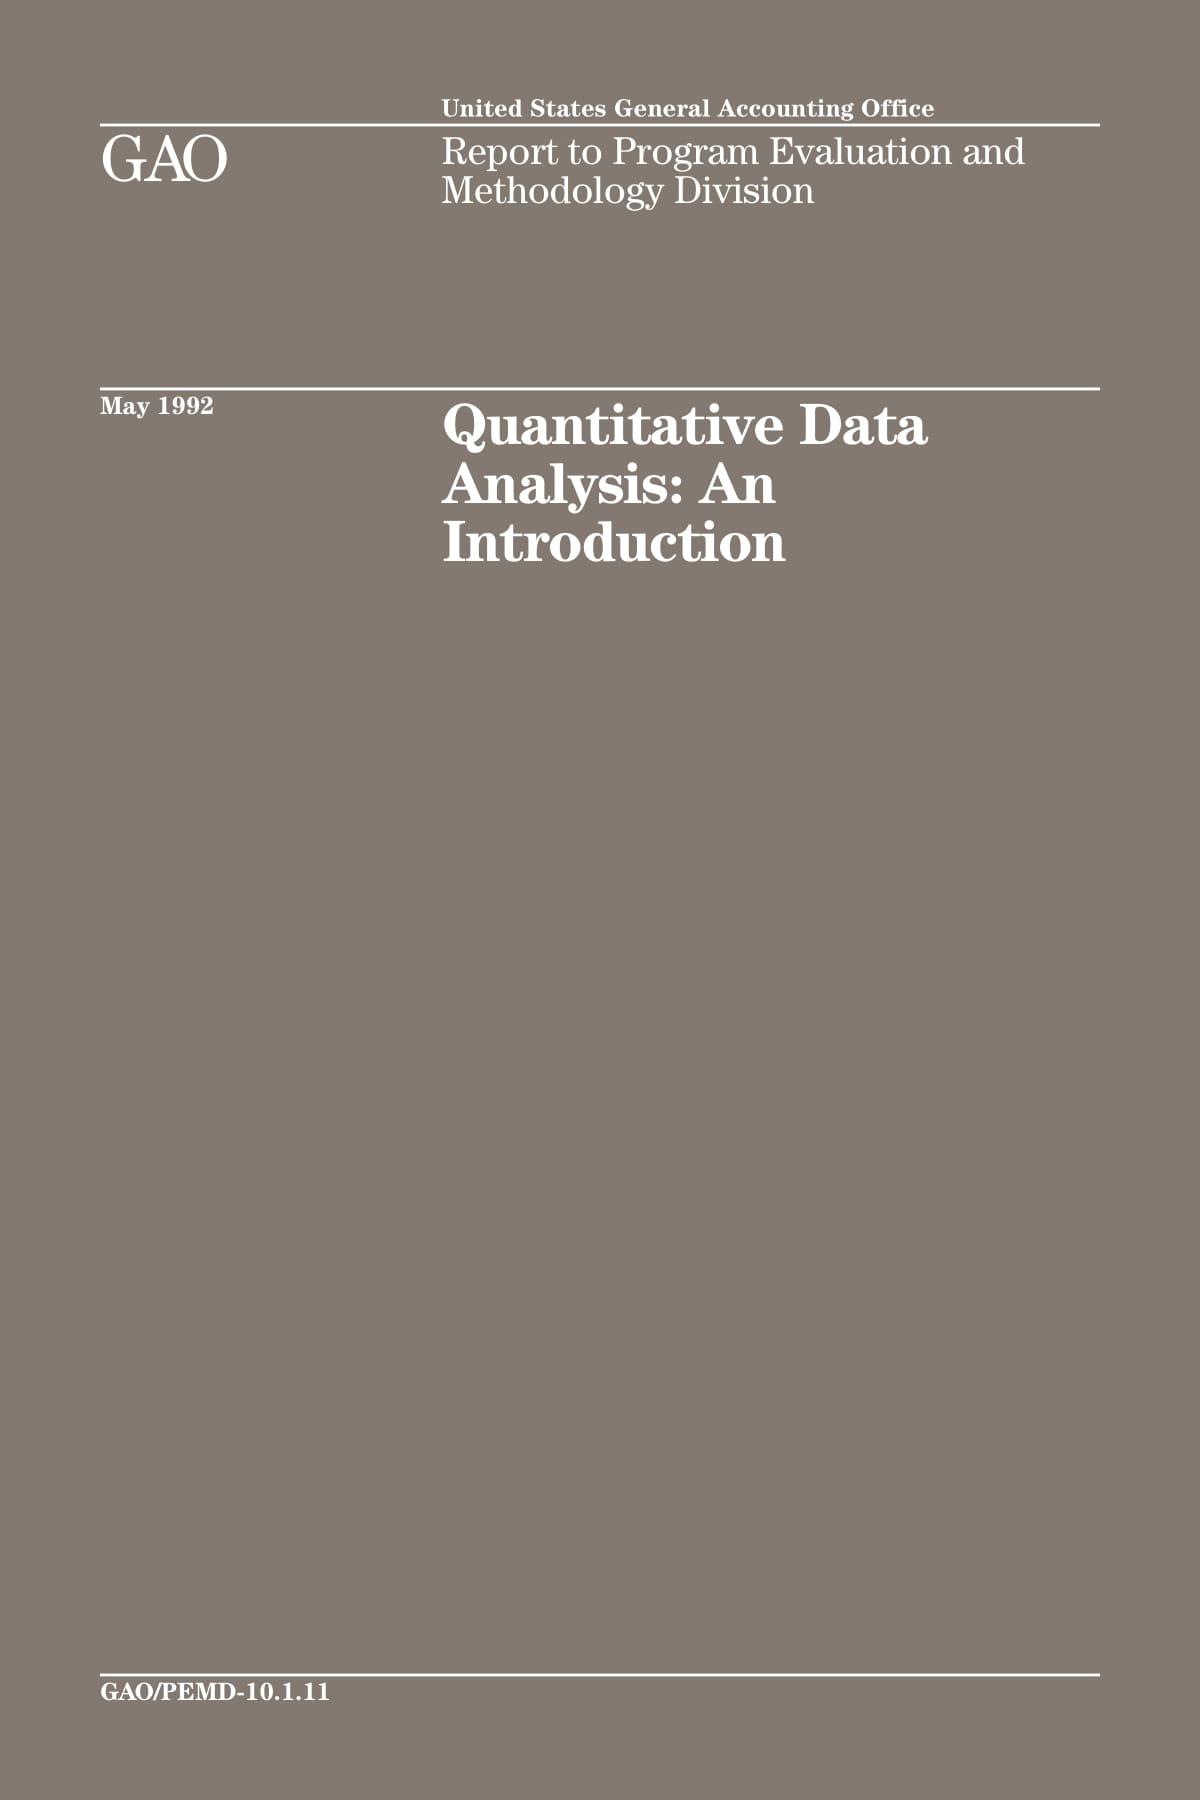 quantitative data analysis introduction report to program evaluation and methodology example 001